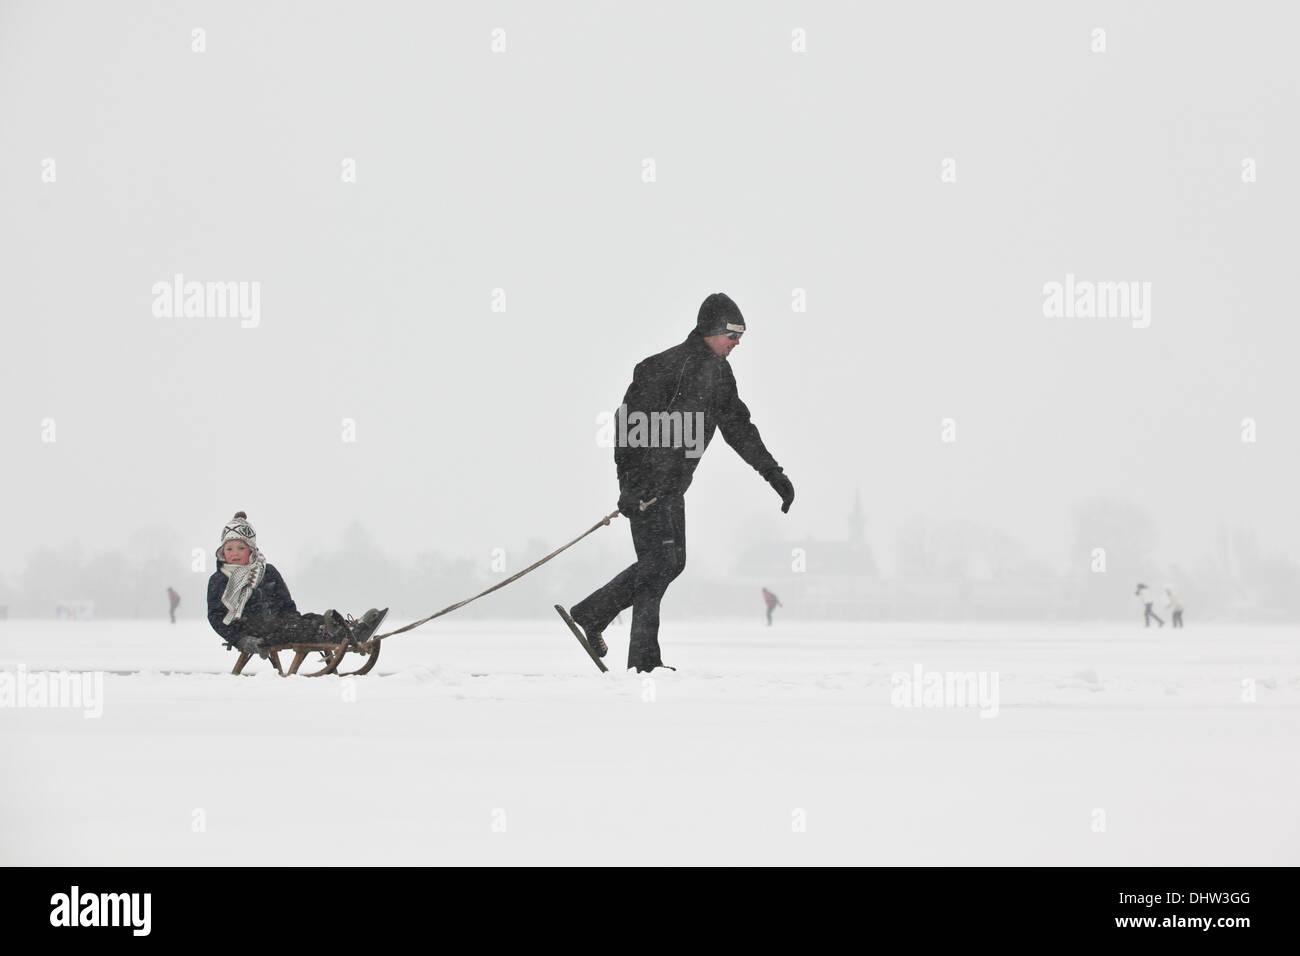 Netherlands, Loosdrecht, Lakes called Loosdrechtse Plassen. Winter. Father ice skating with son on sledge Stock Photo